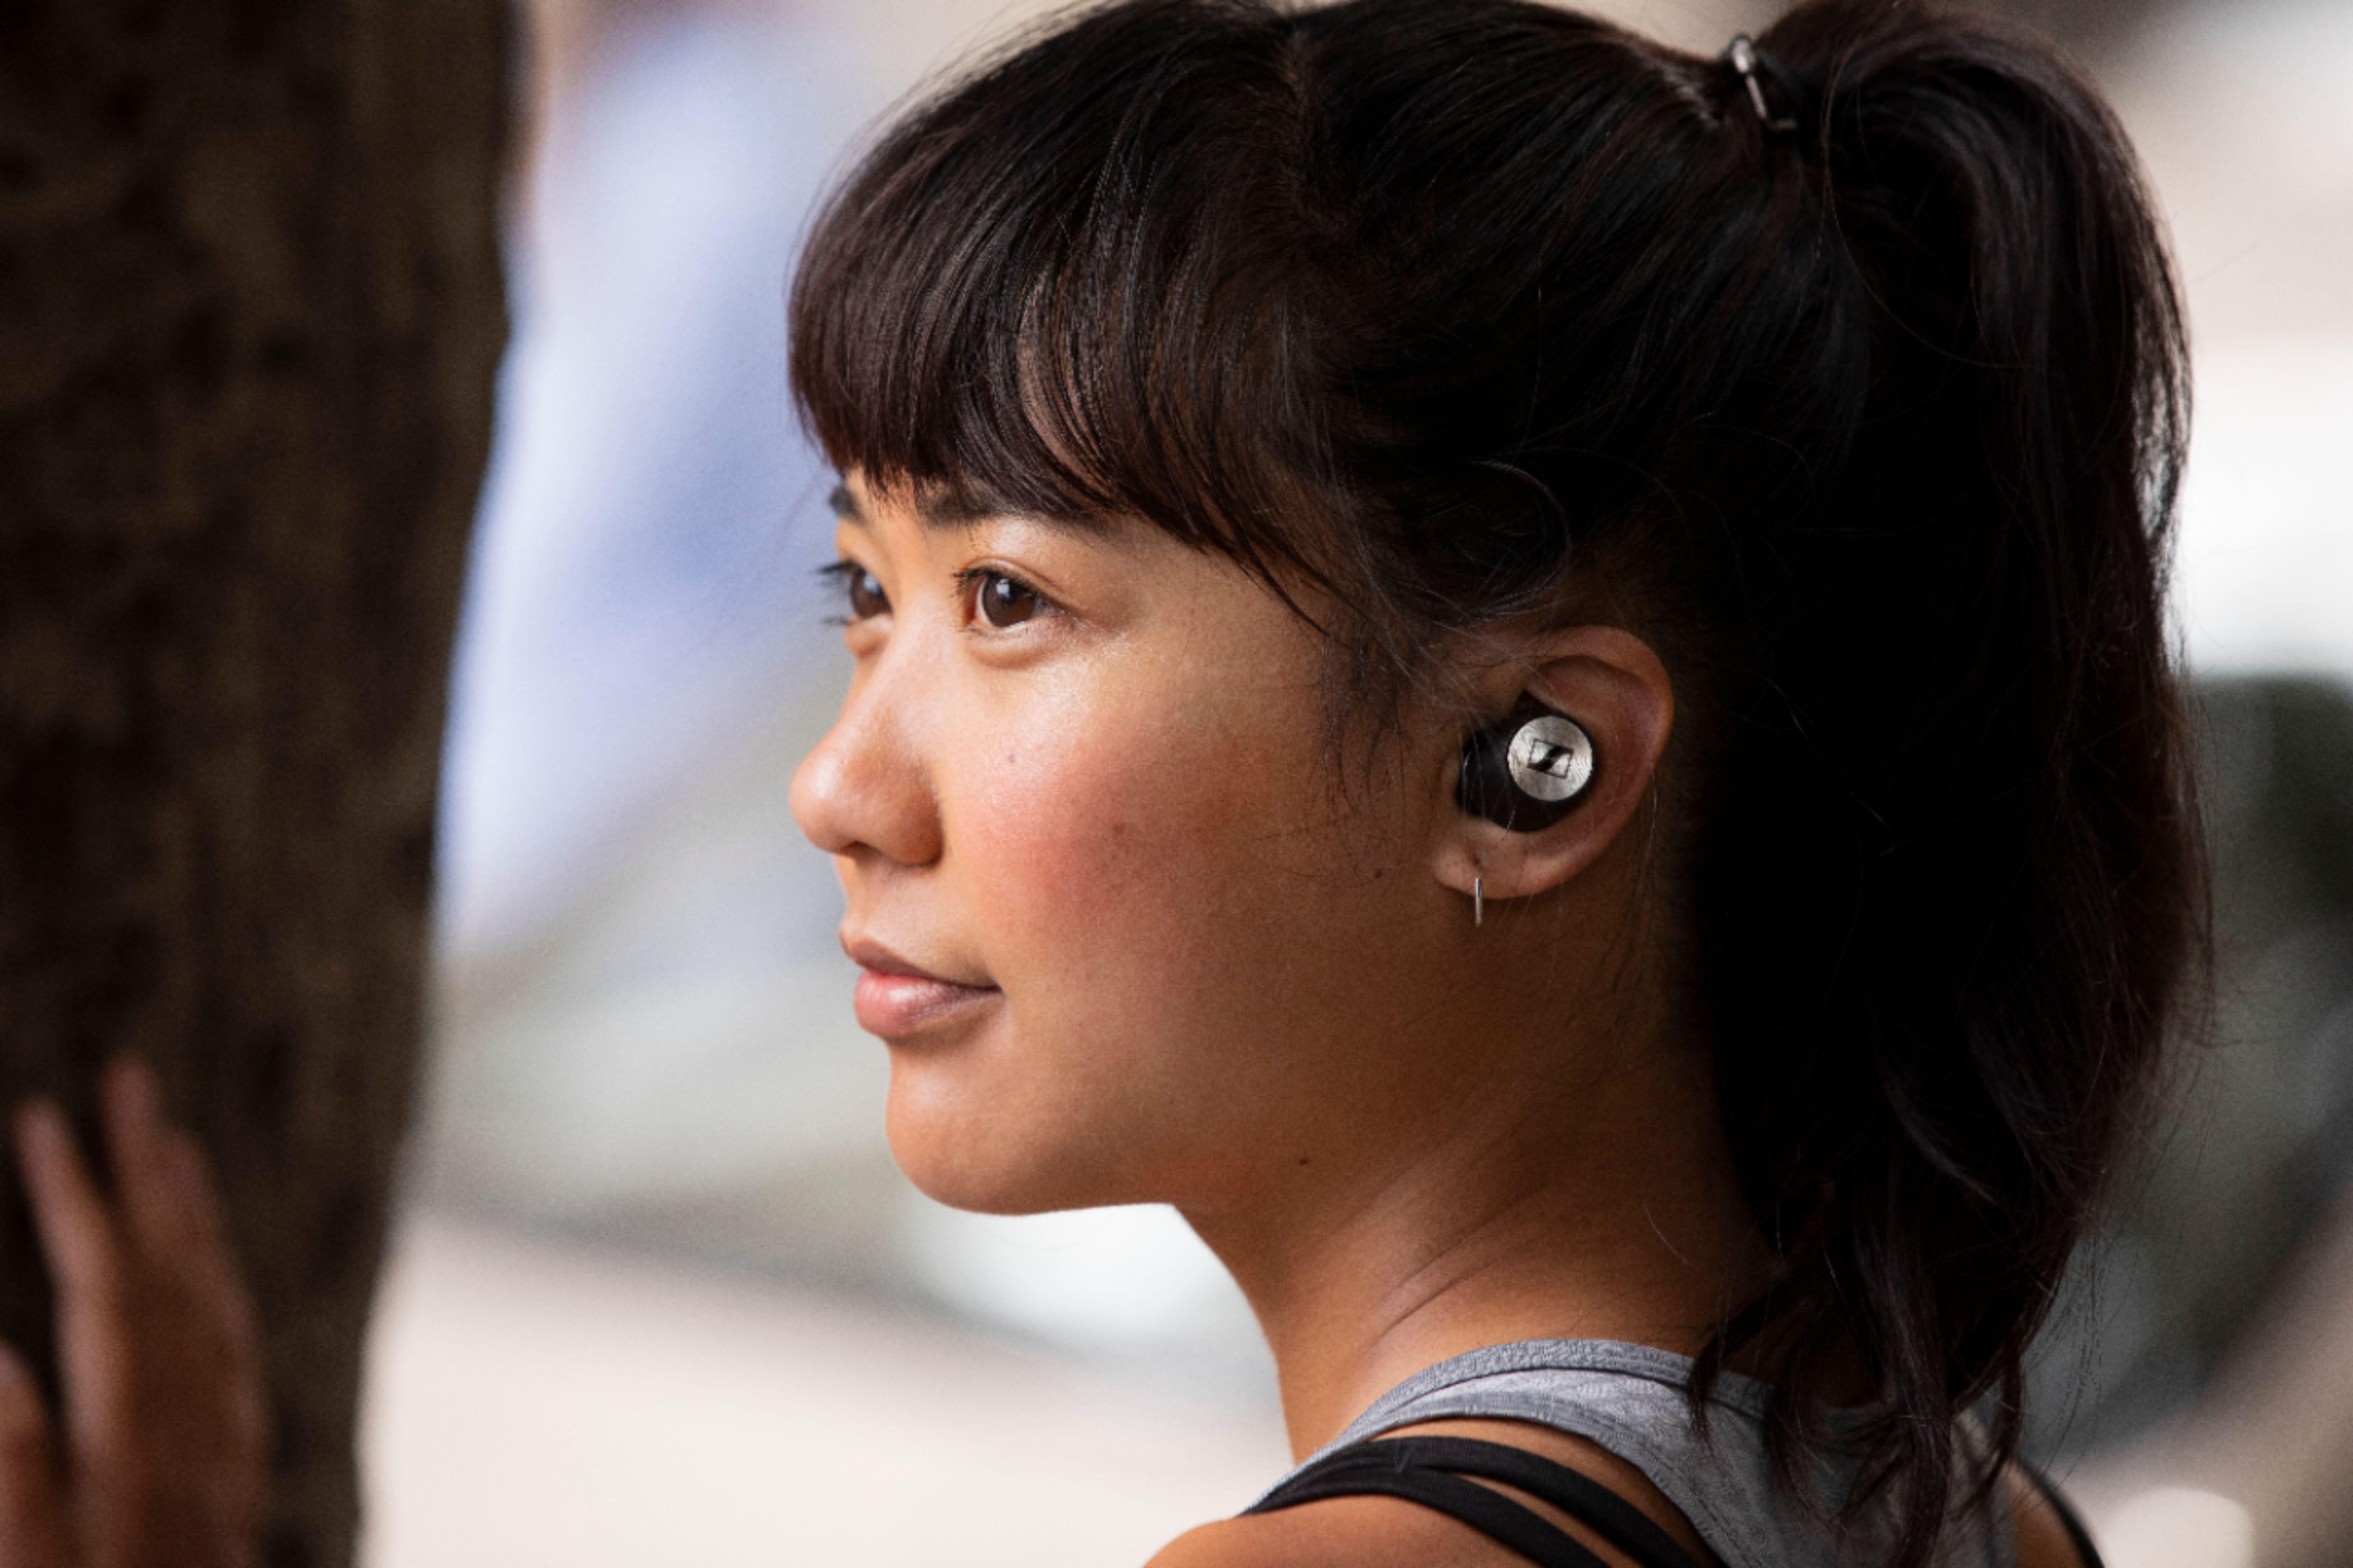 sennheiser earbuds review